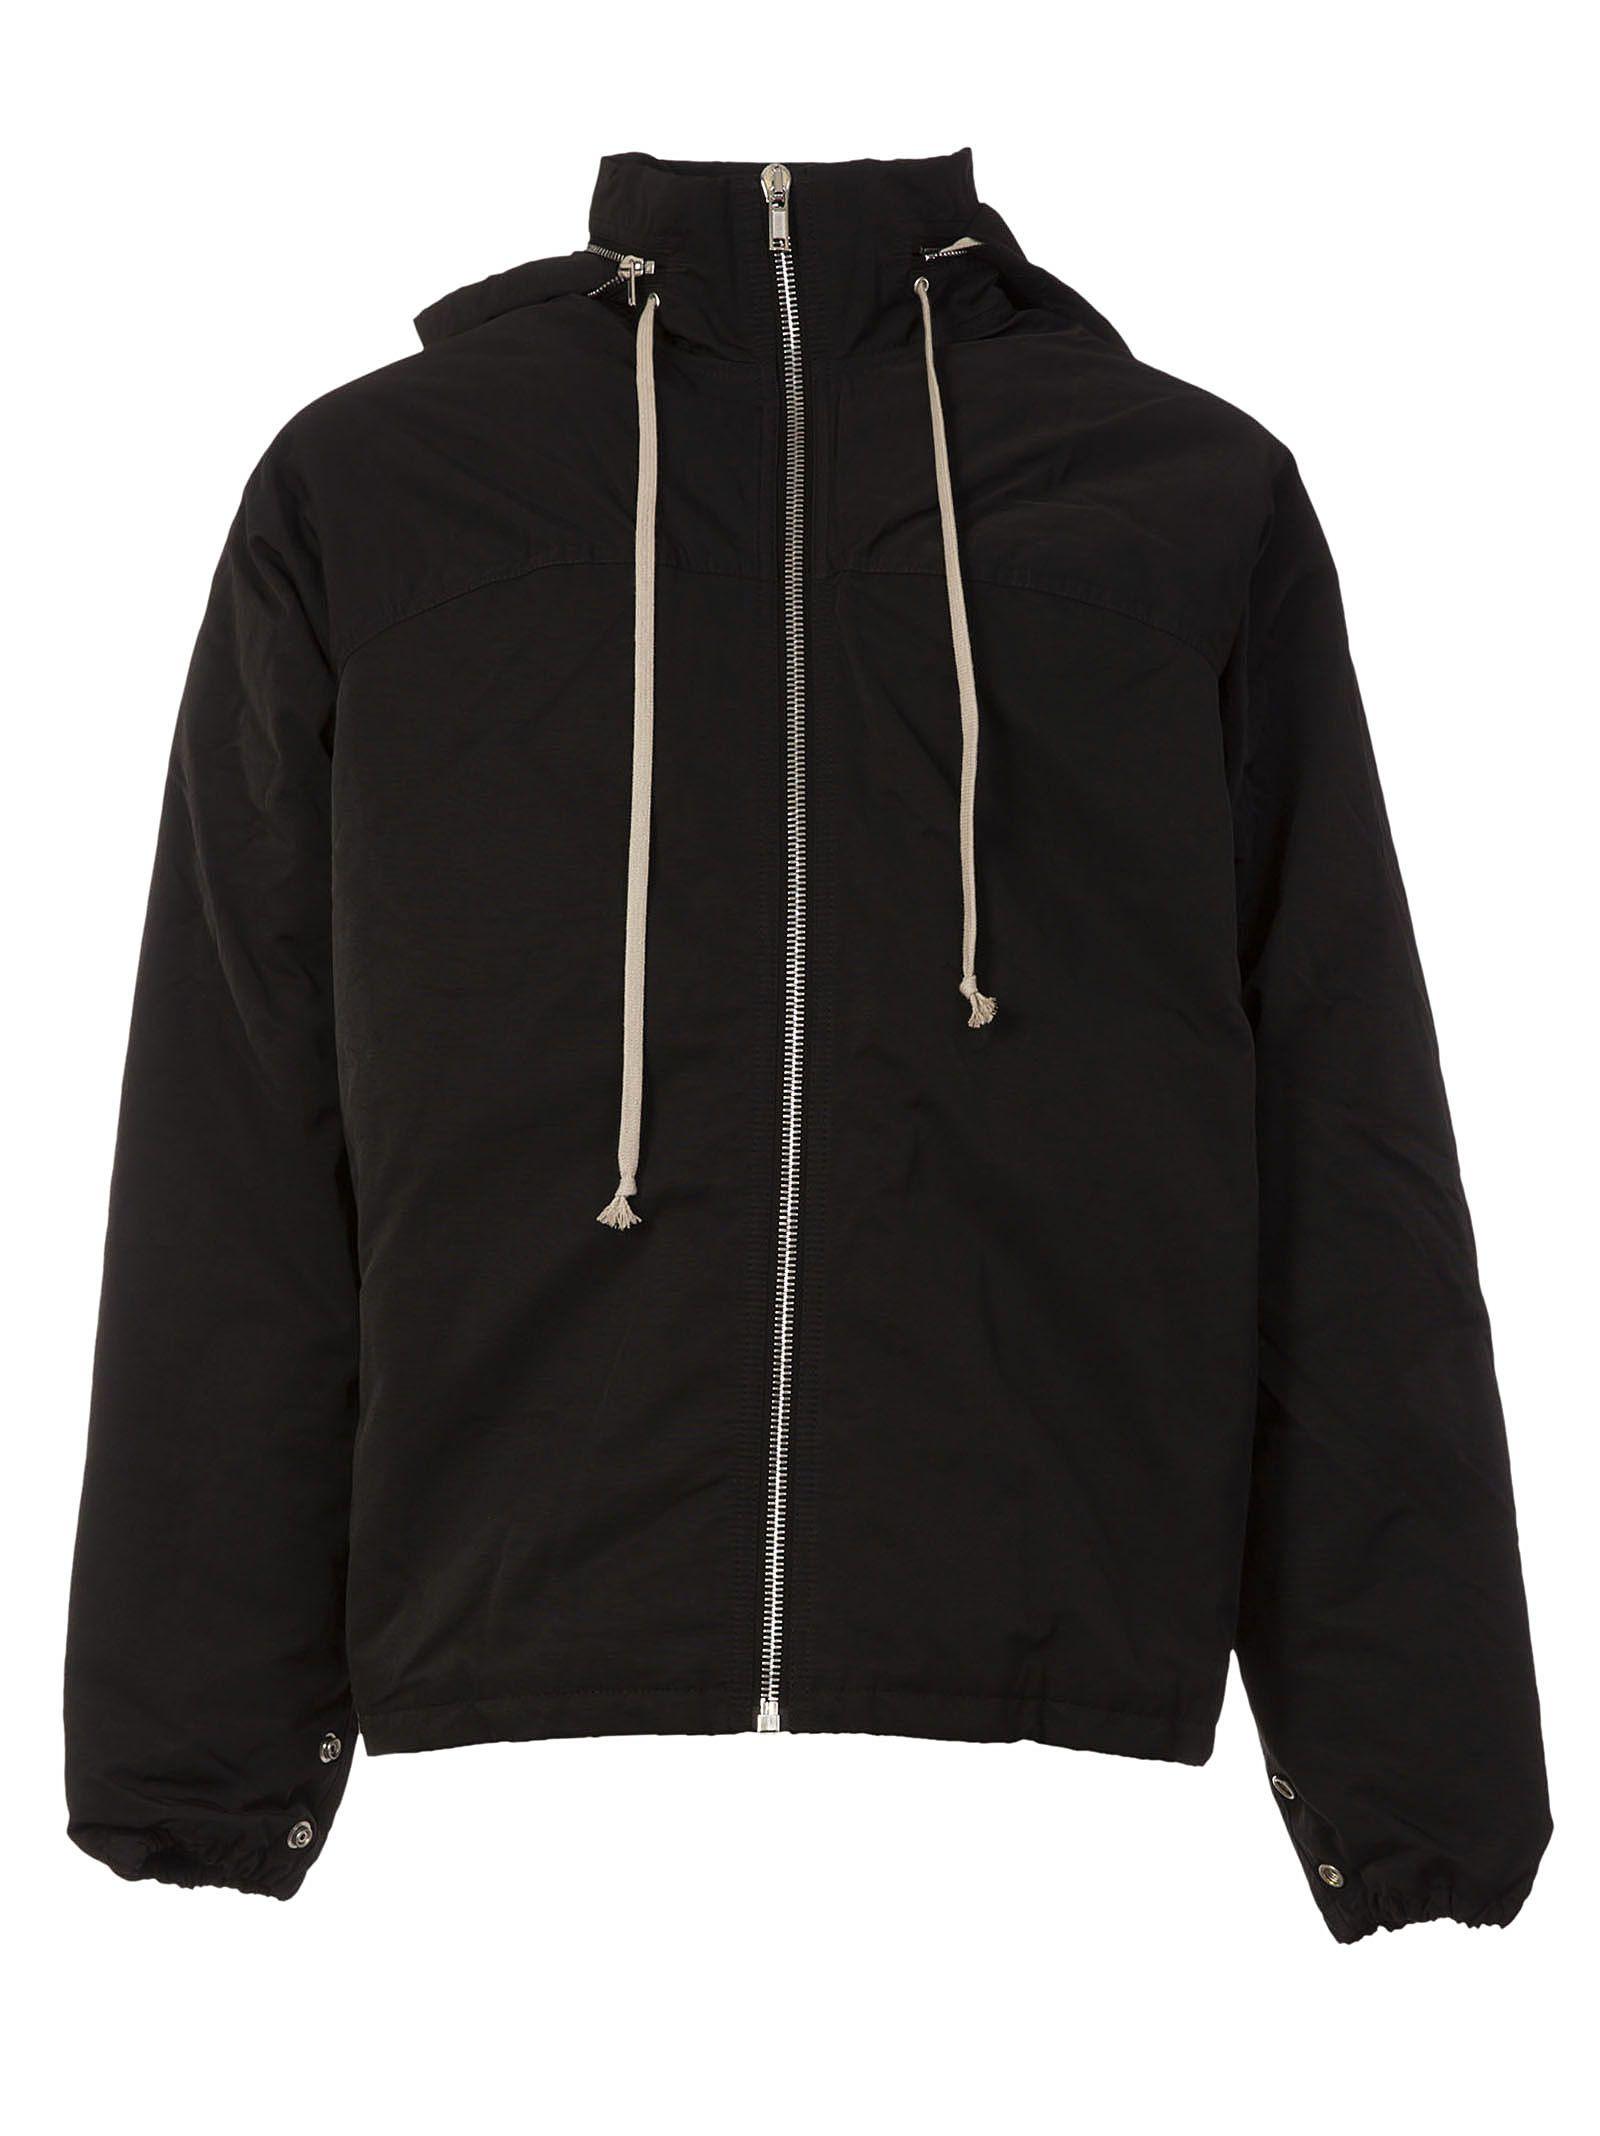 Drkshdw Drawstring Hooded Jacket